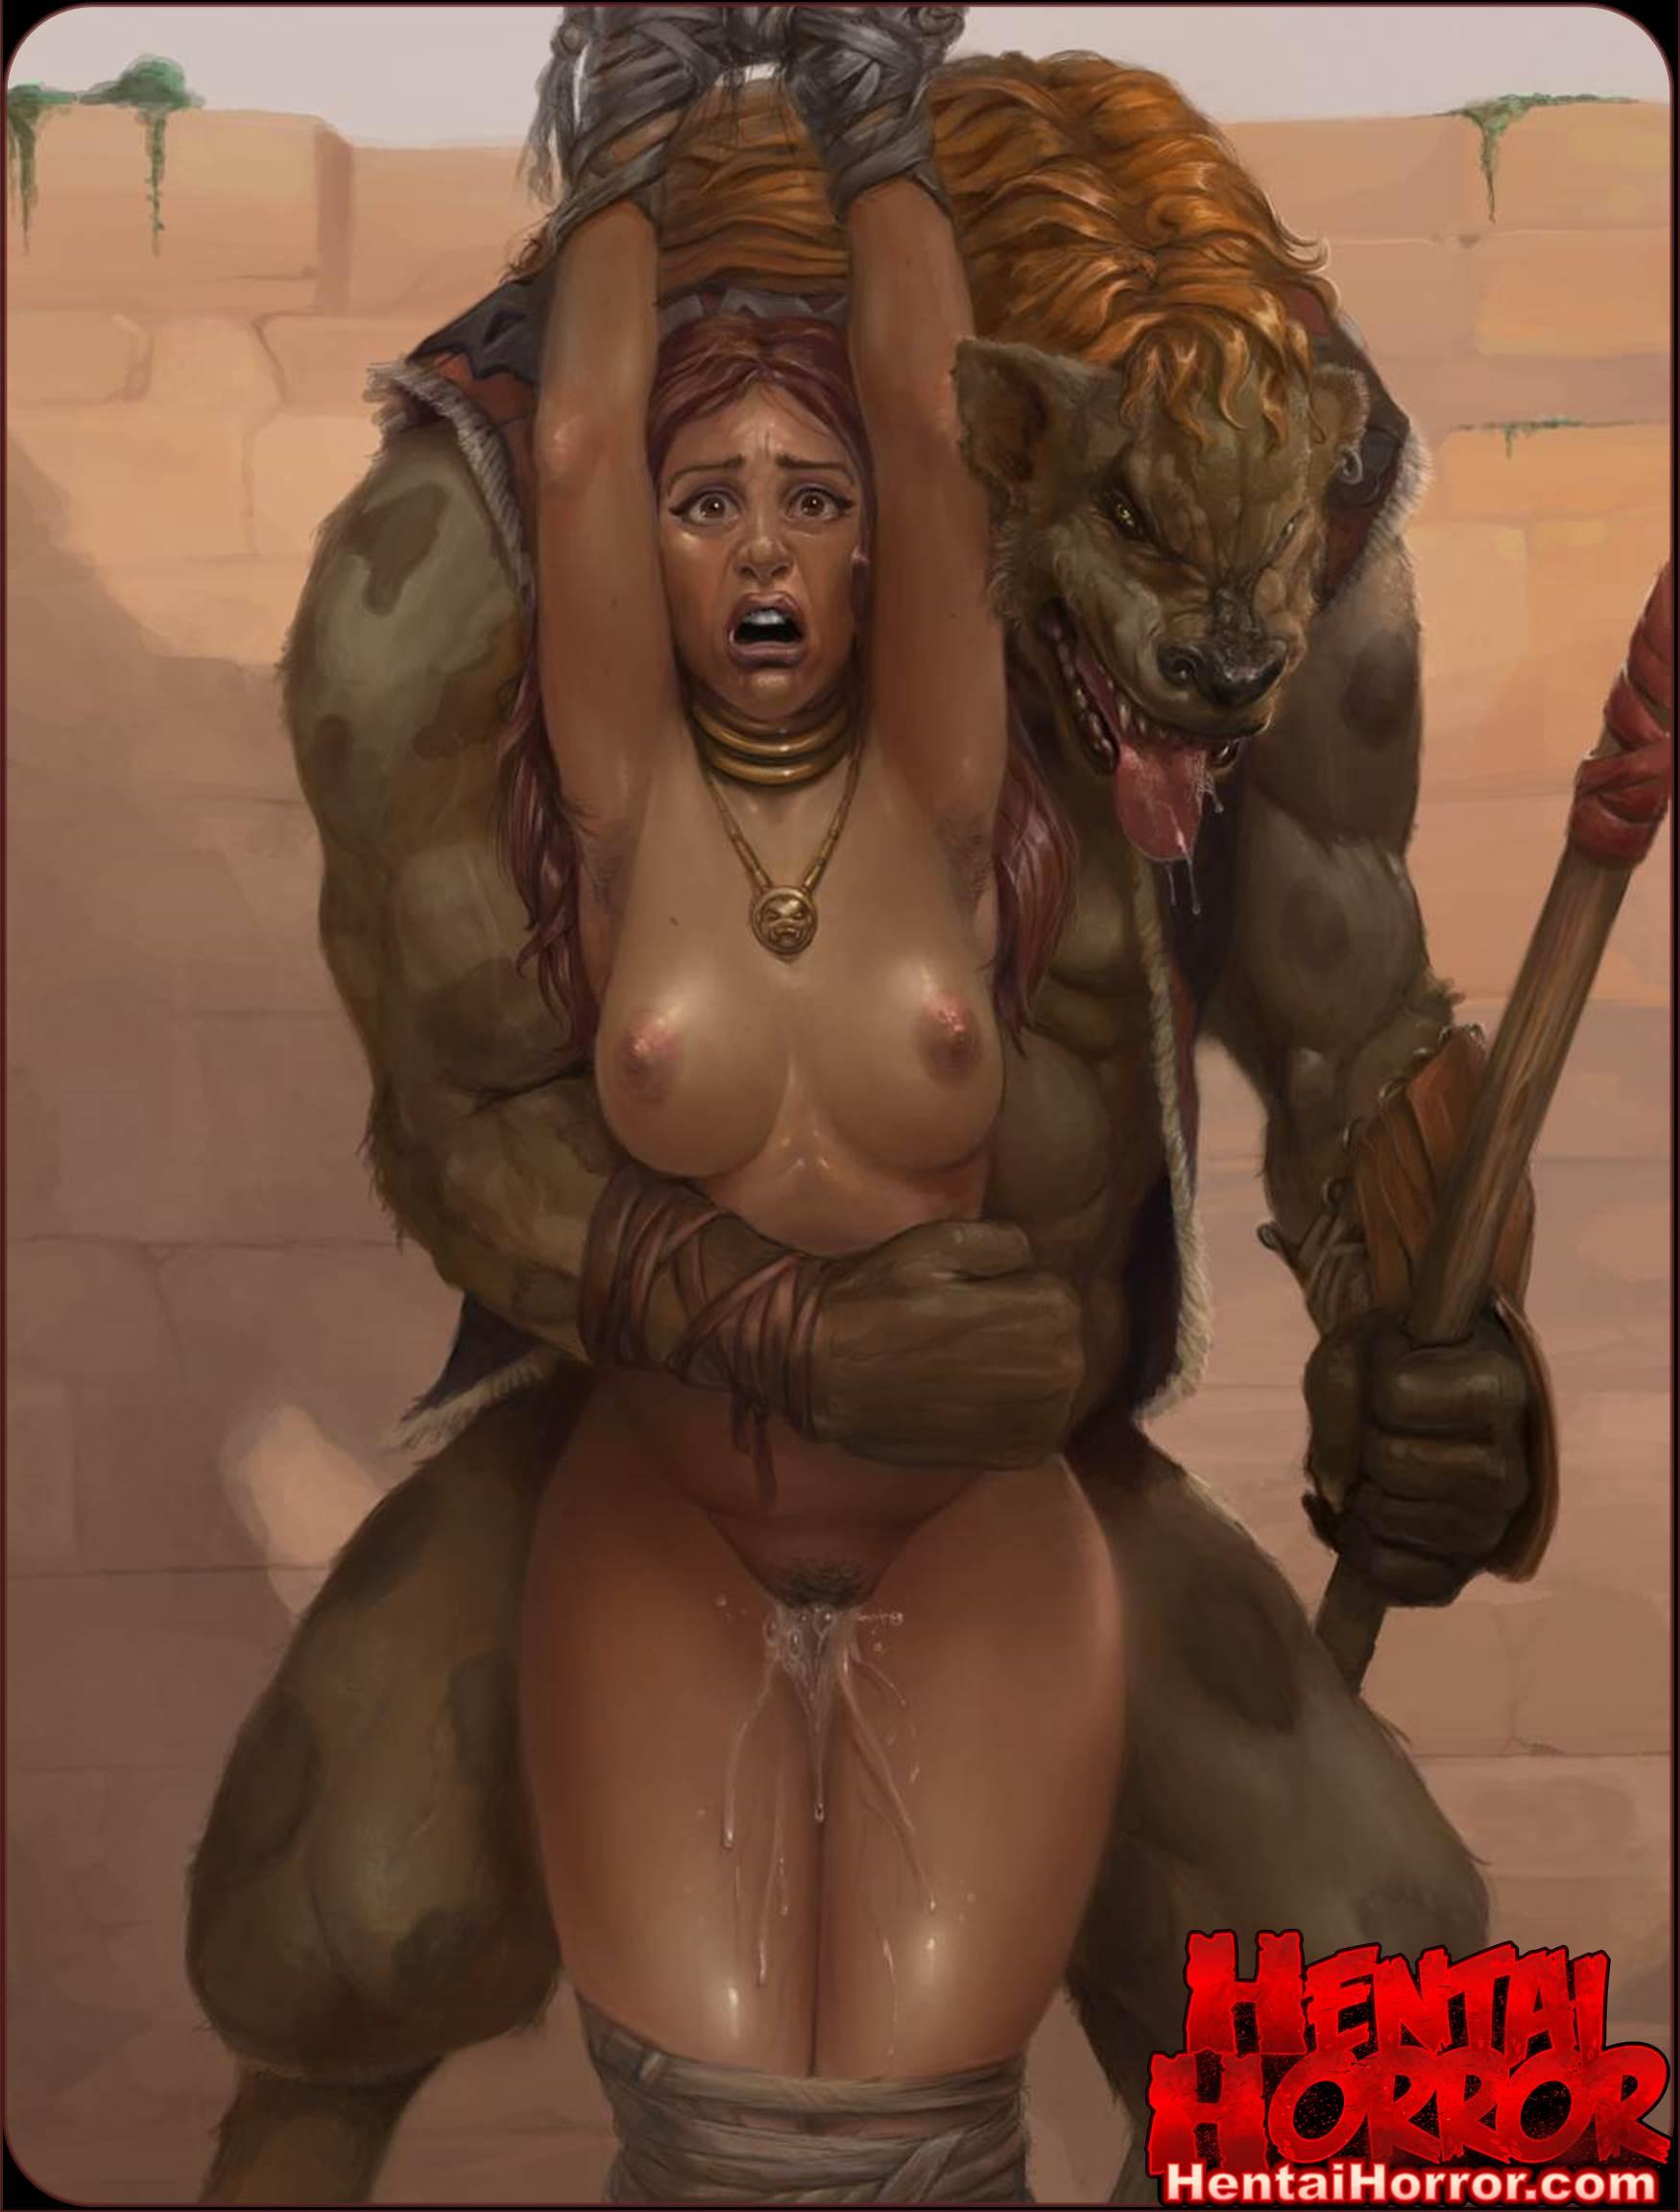 dungeonsanddragonsbugbear monsterrape bigtitsporn horrormonstercock xxxgamesmmorpgbdsm